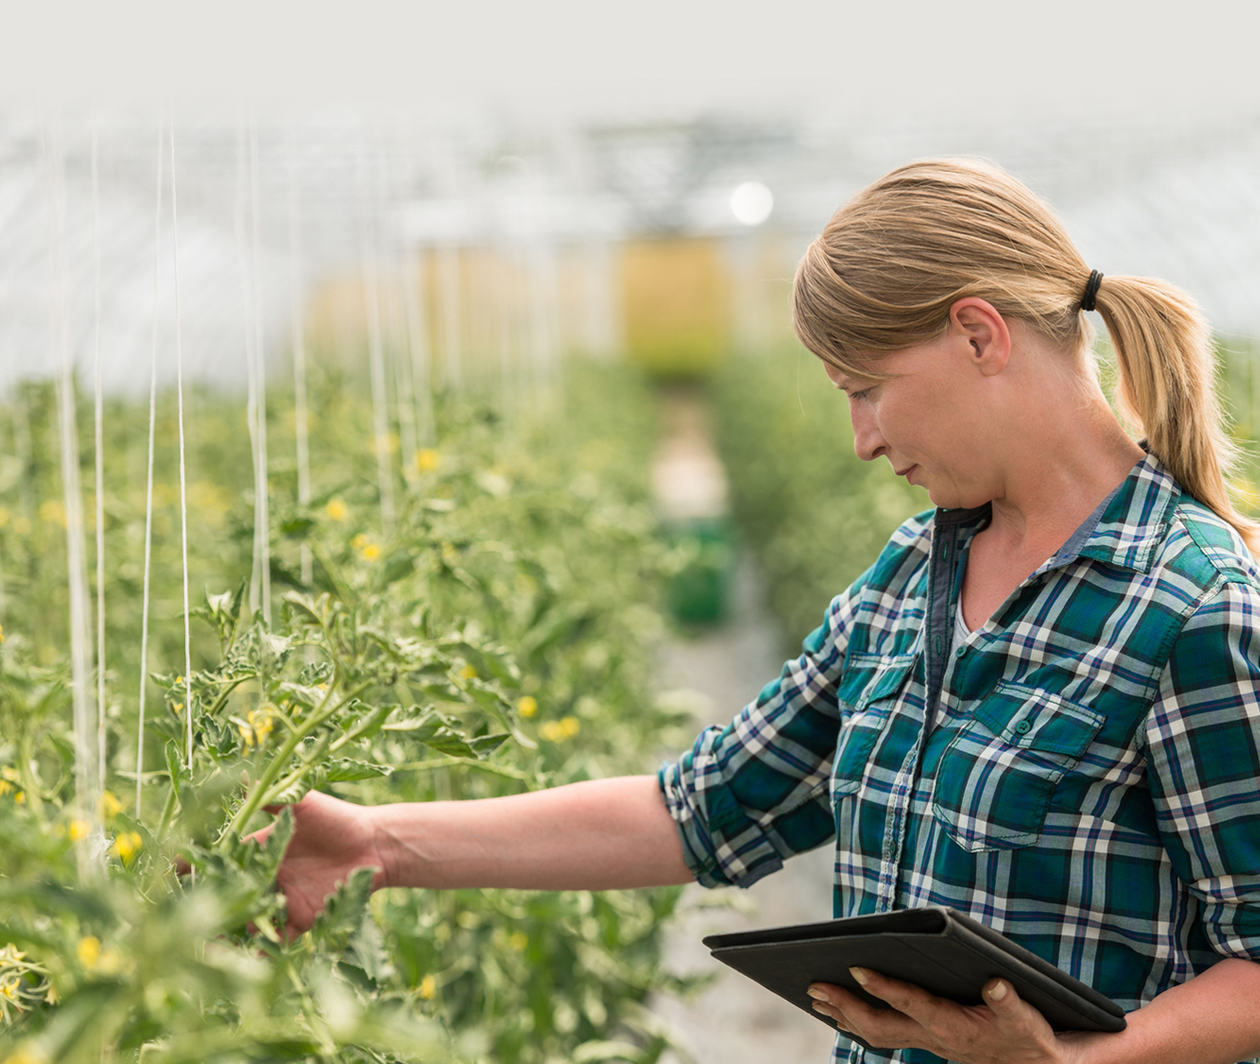 Explore How Farmers Produce Food Sustainably